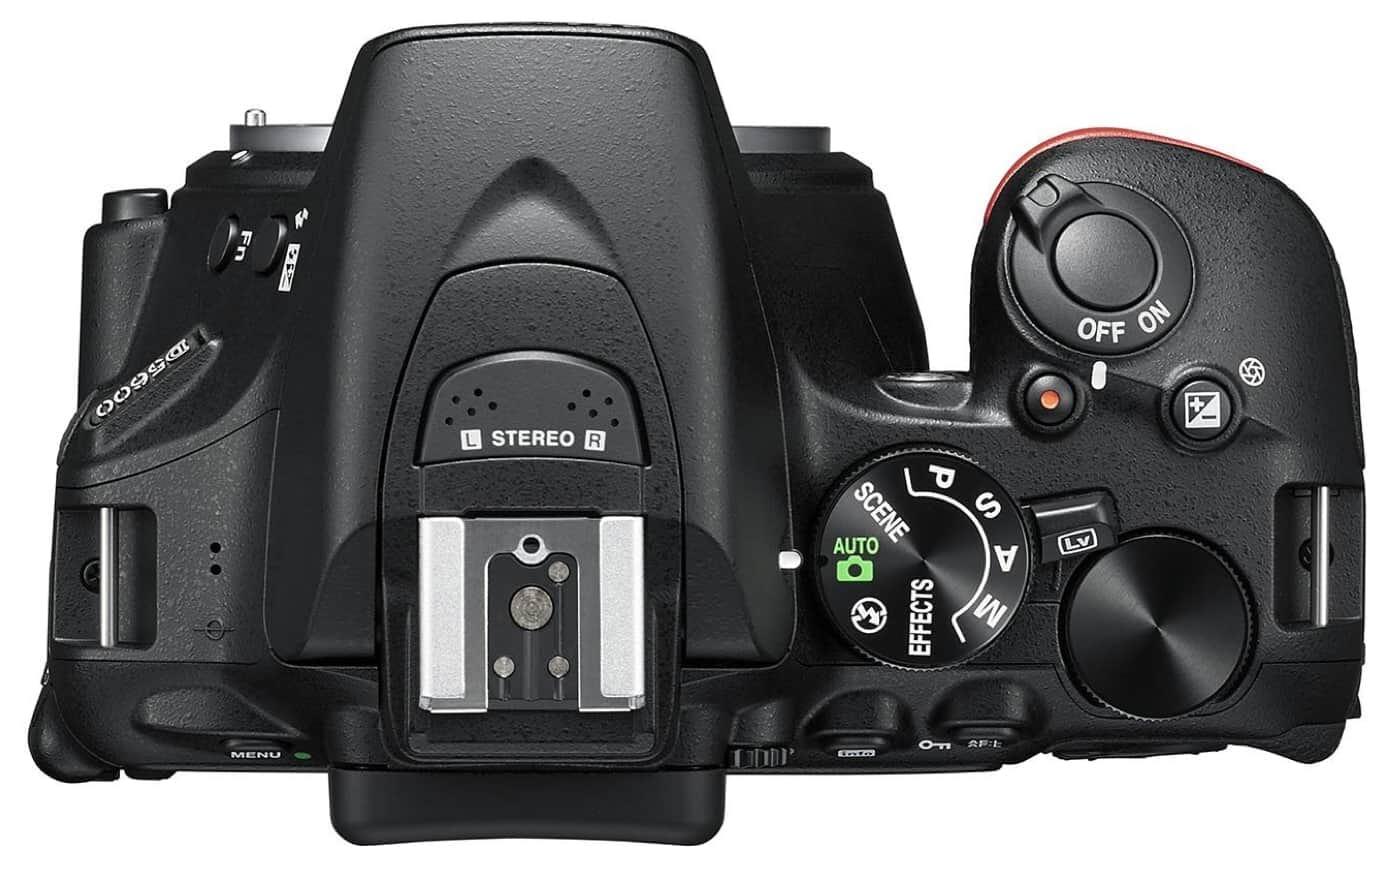 Best Nikon DSLR under $1,000 #2 D5600 DX-Format DSLR